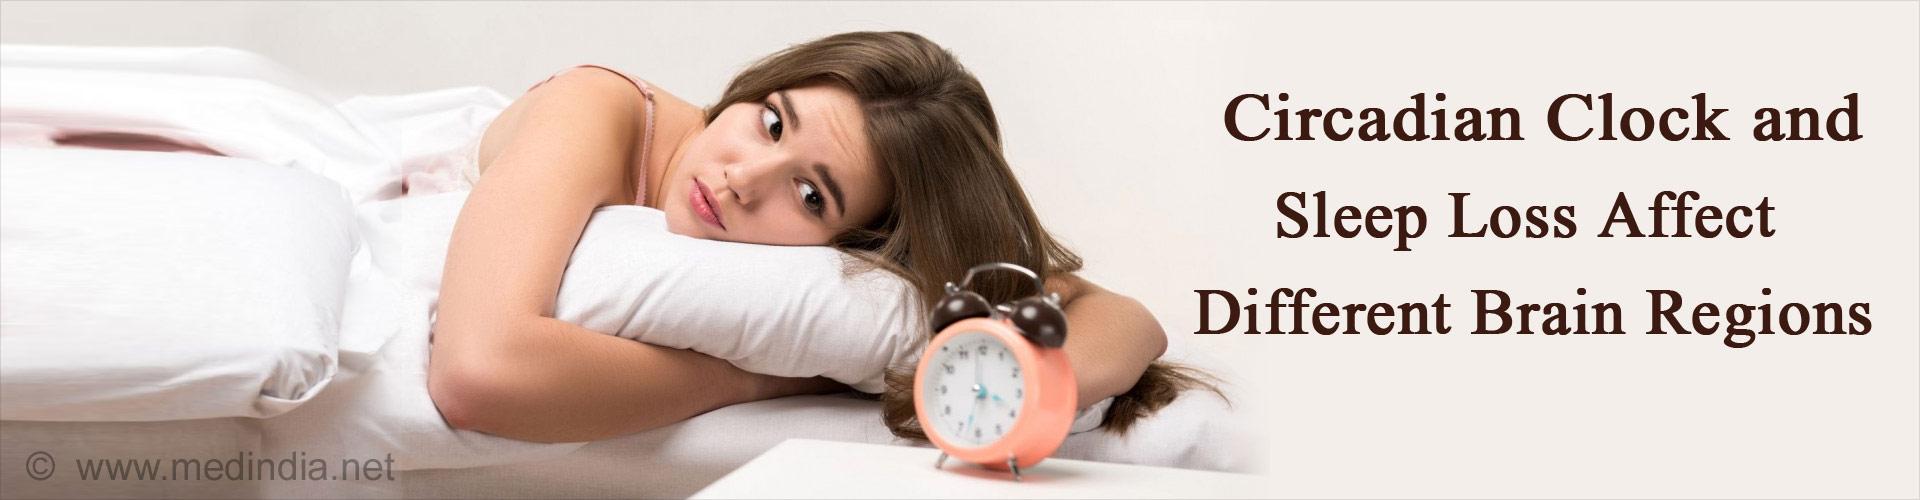 Circadian Clock and Sleep Loss Affect Different Brain Regions